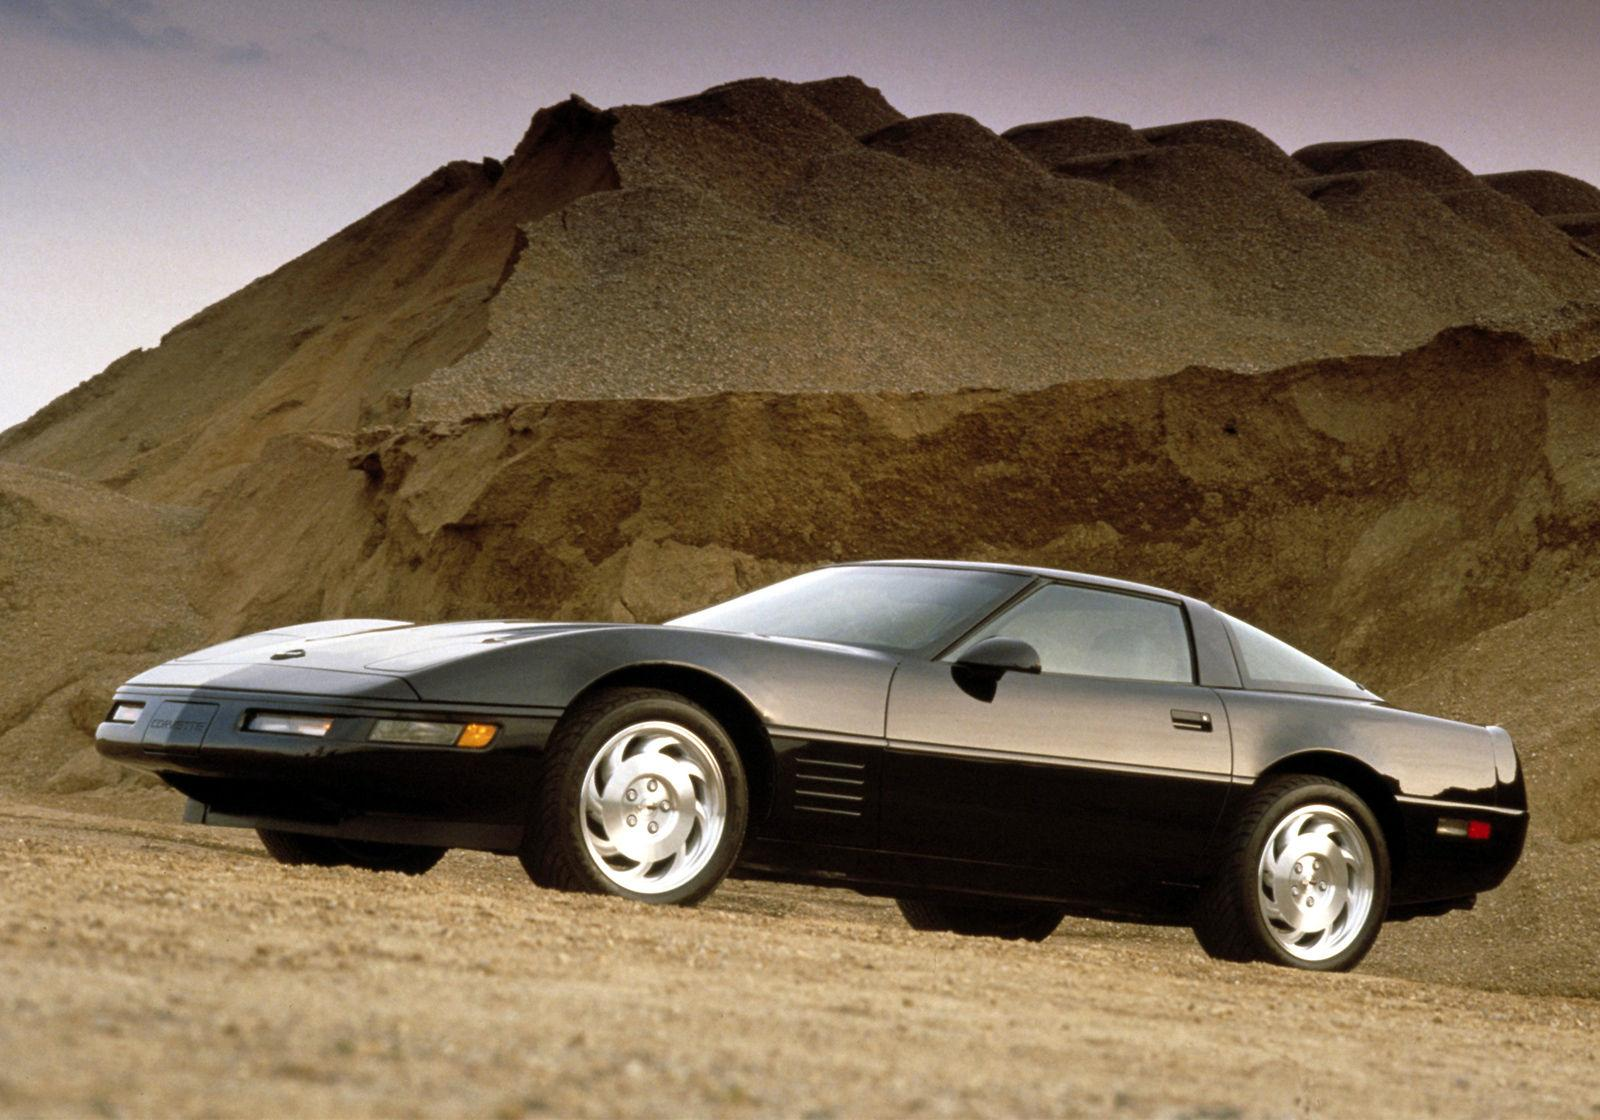 Corvette C4 Bj 1991